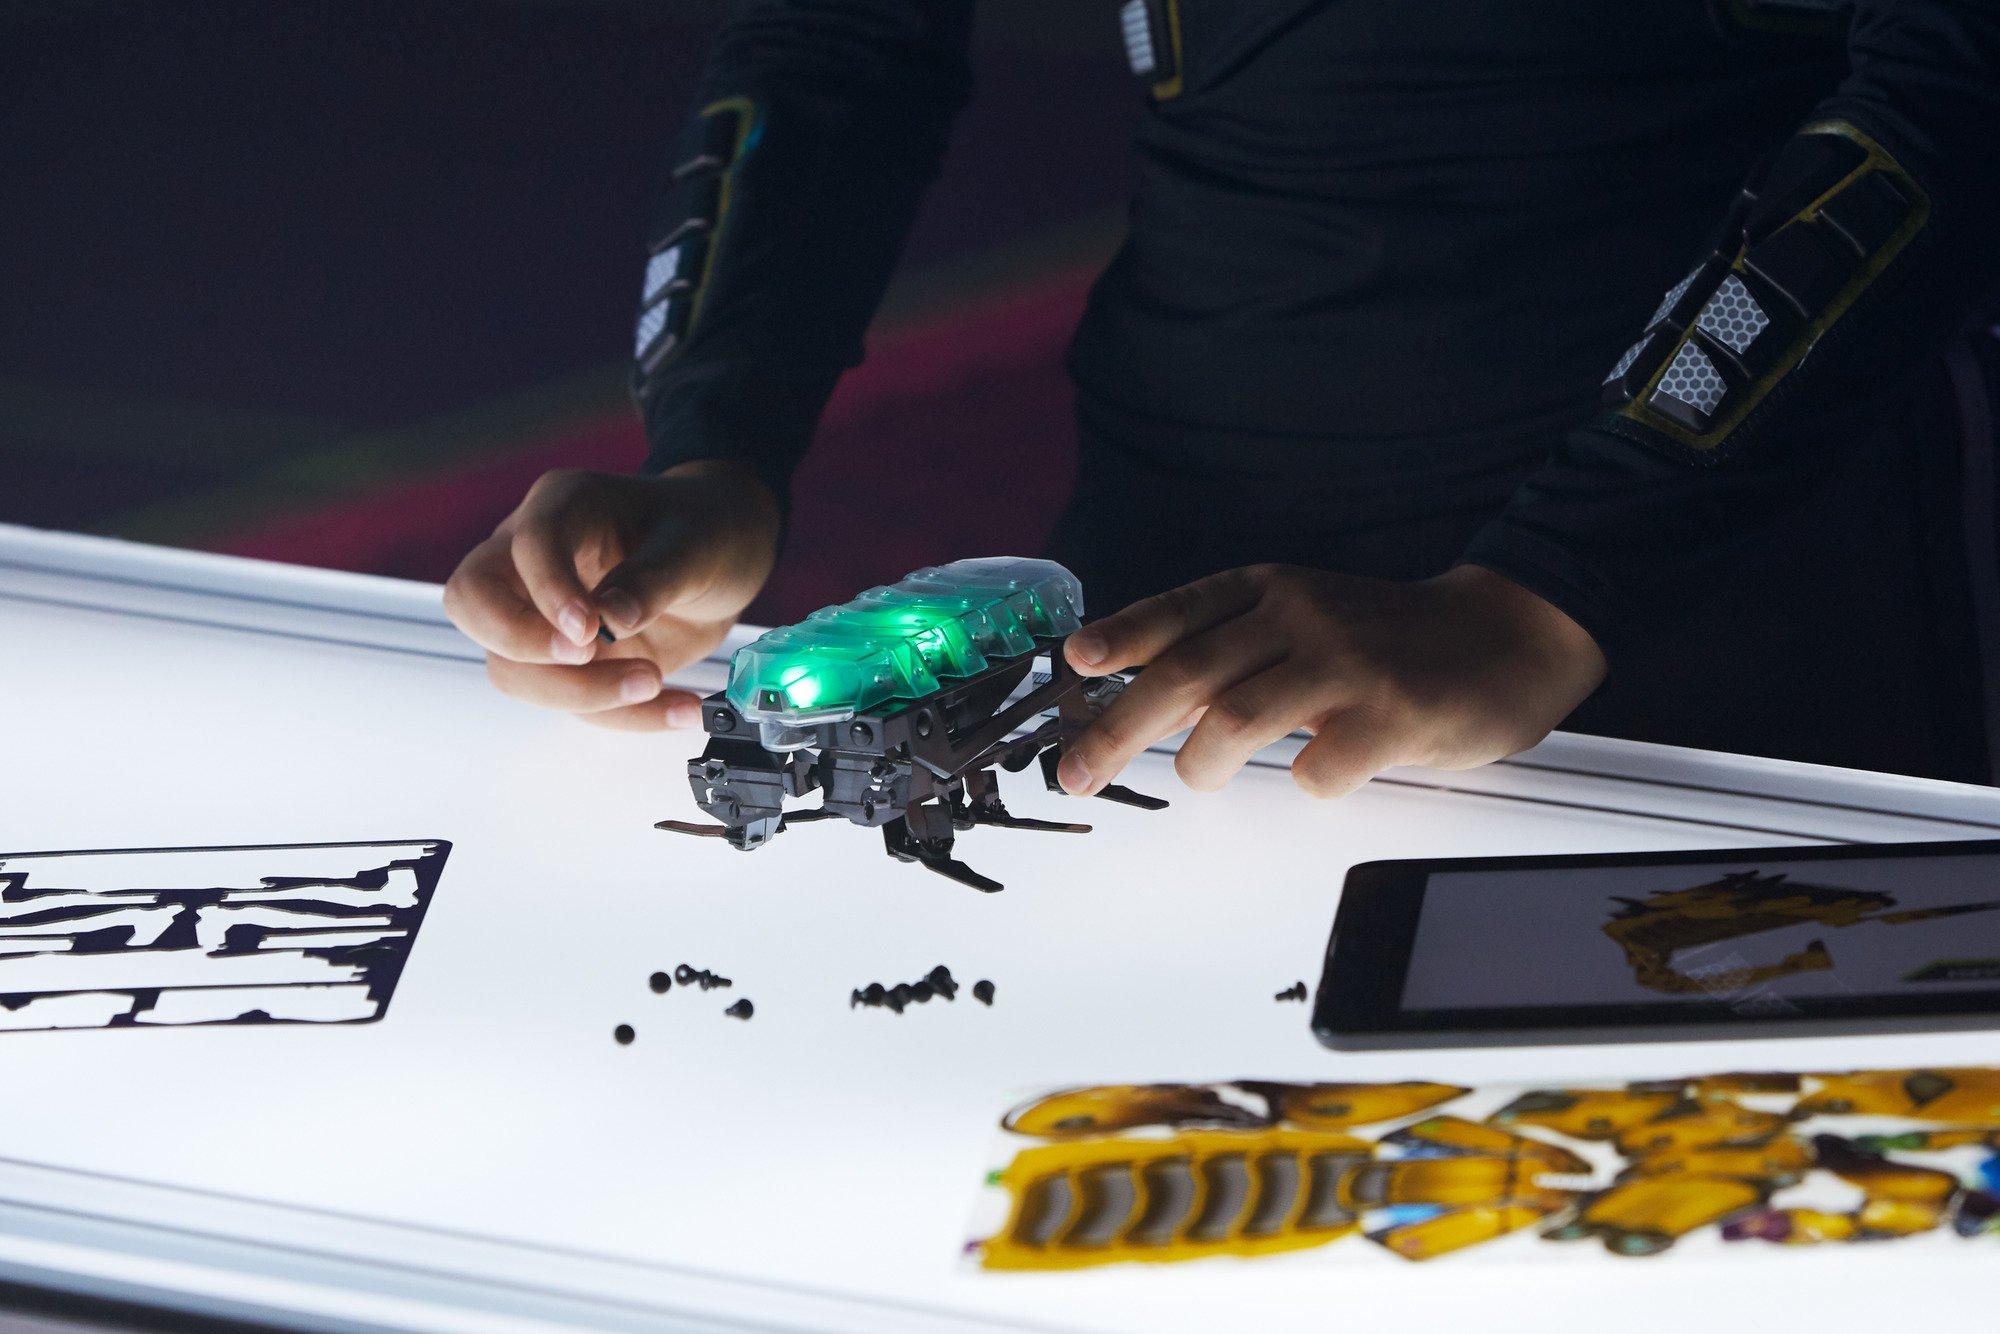 Kamigami Atlasar Robot by Mattel (Image #5)